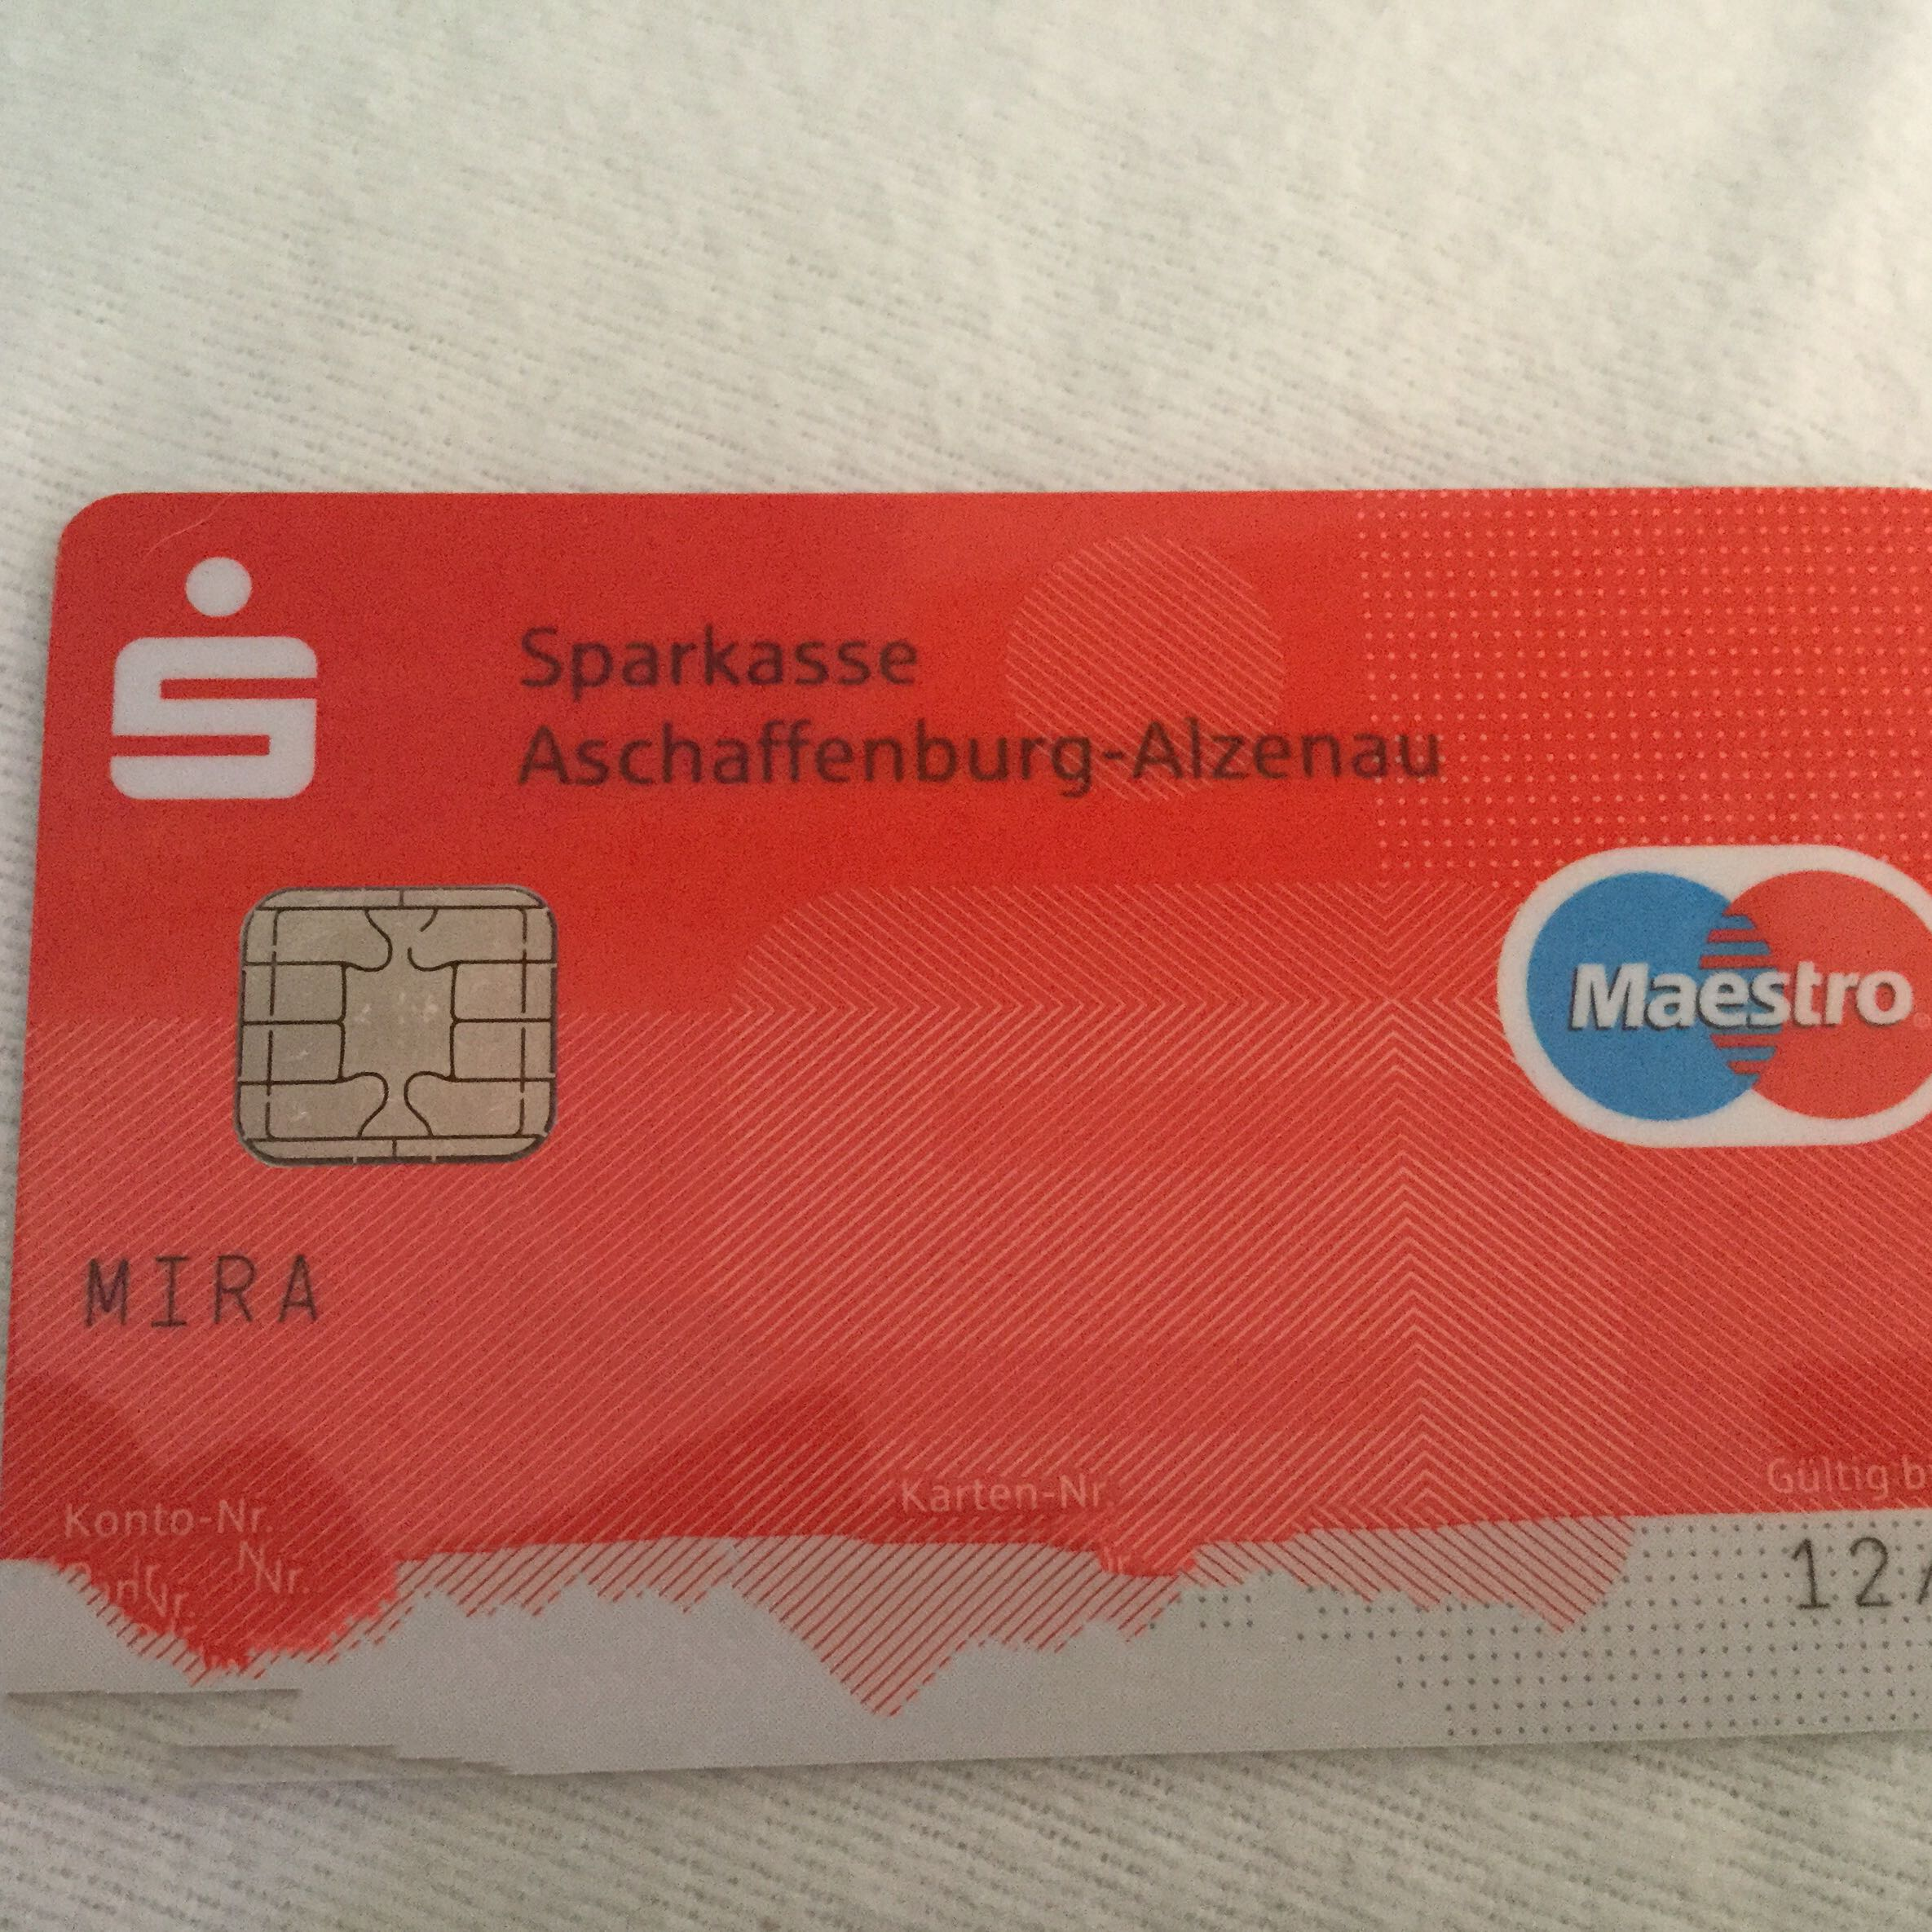 Sicherheitscode Kreditkarte Maestro